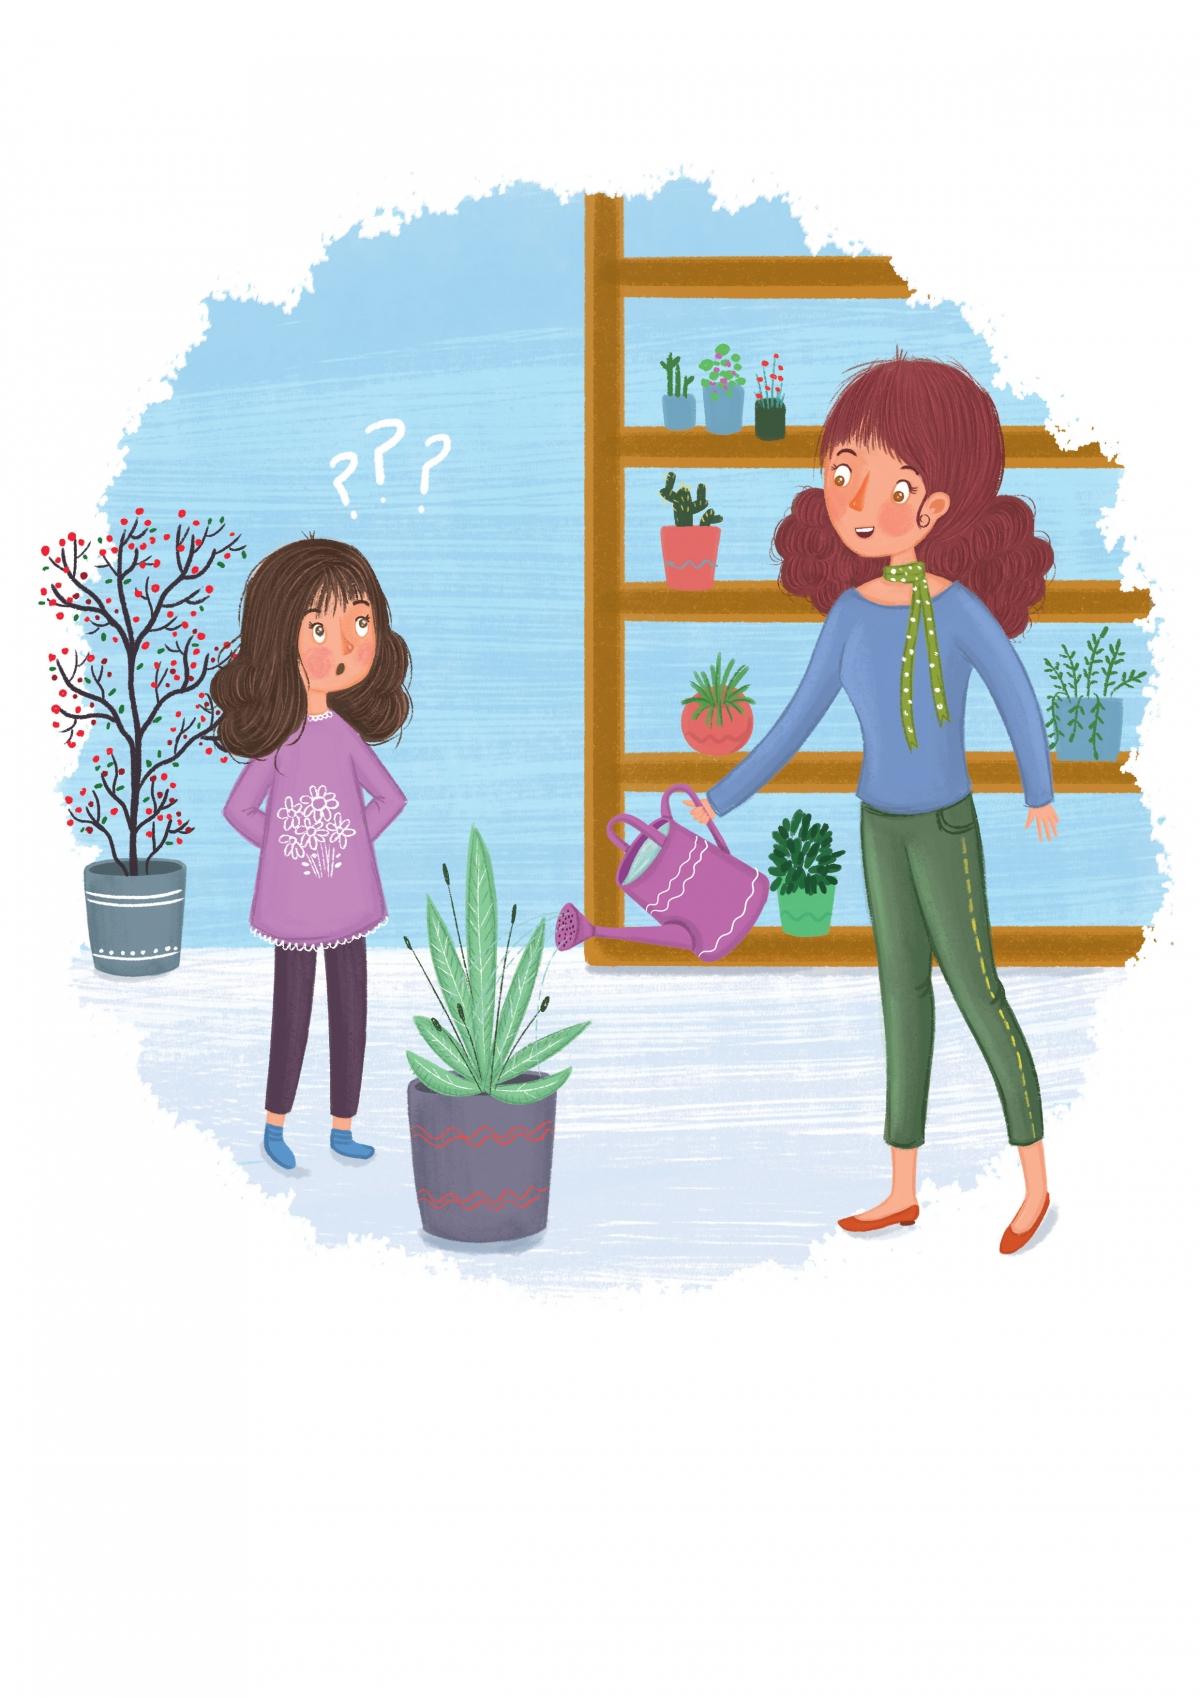 puzzle illustration for a children's magazine